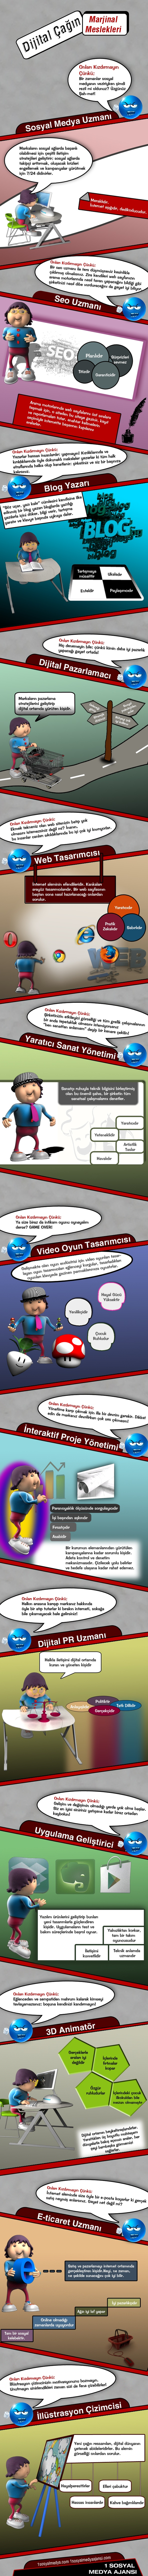 Dijital Meslekler & Erhan Kısmet